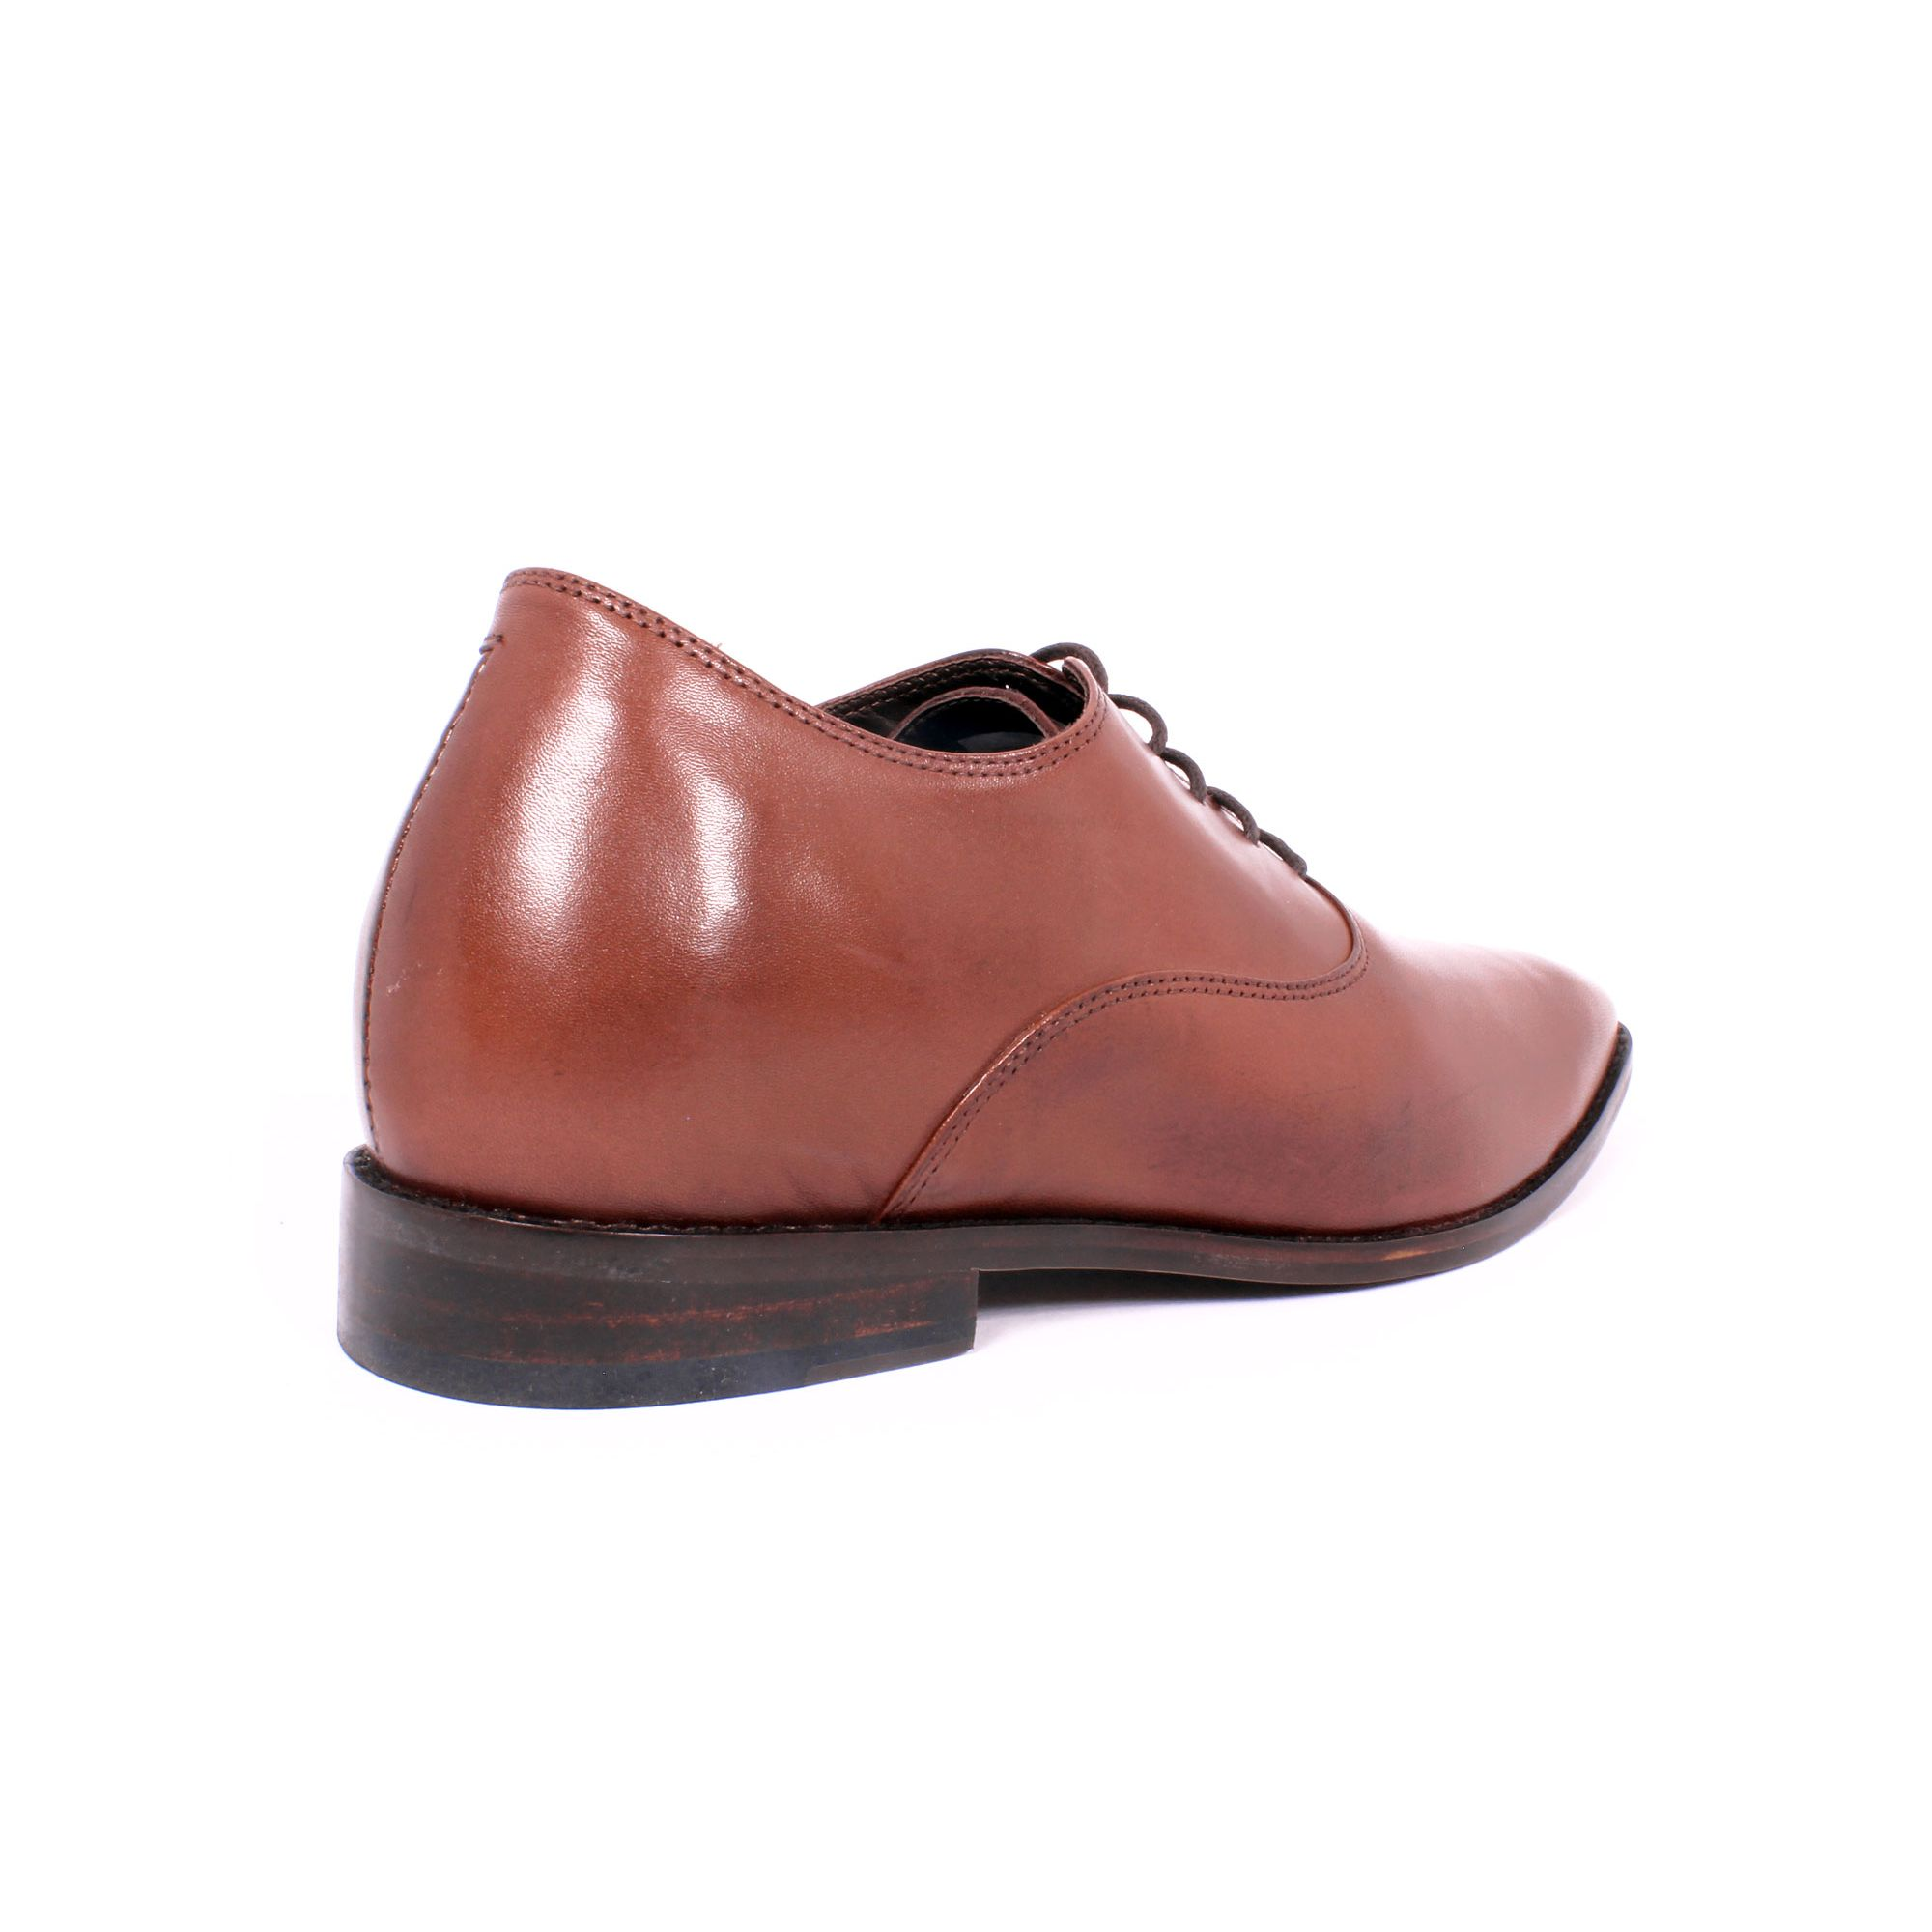 Zapato Formal Elegant Café Max Denegri +7cm de Altura_70804